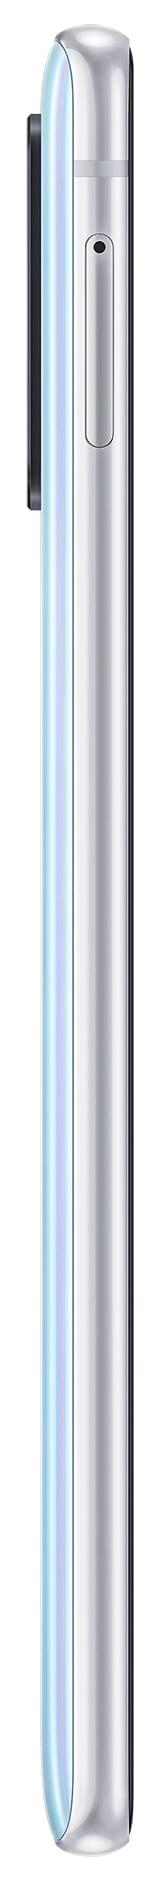 Samsung Galaxy S10 Lite (RAM 8 GB, 128 GB, Prism White)